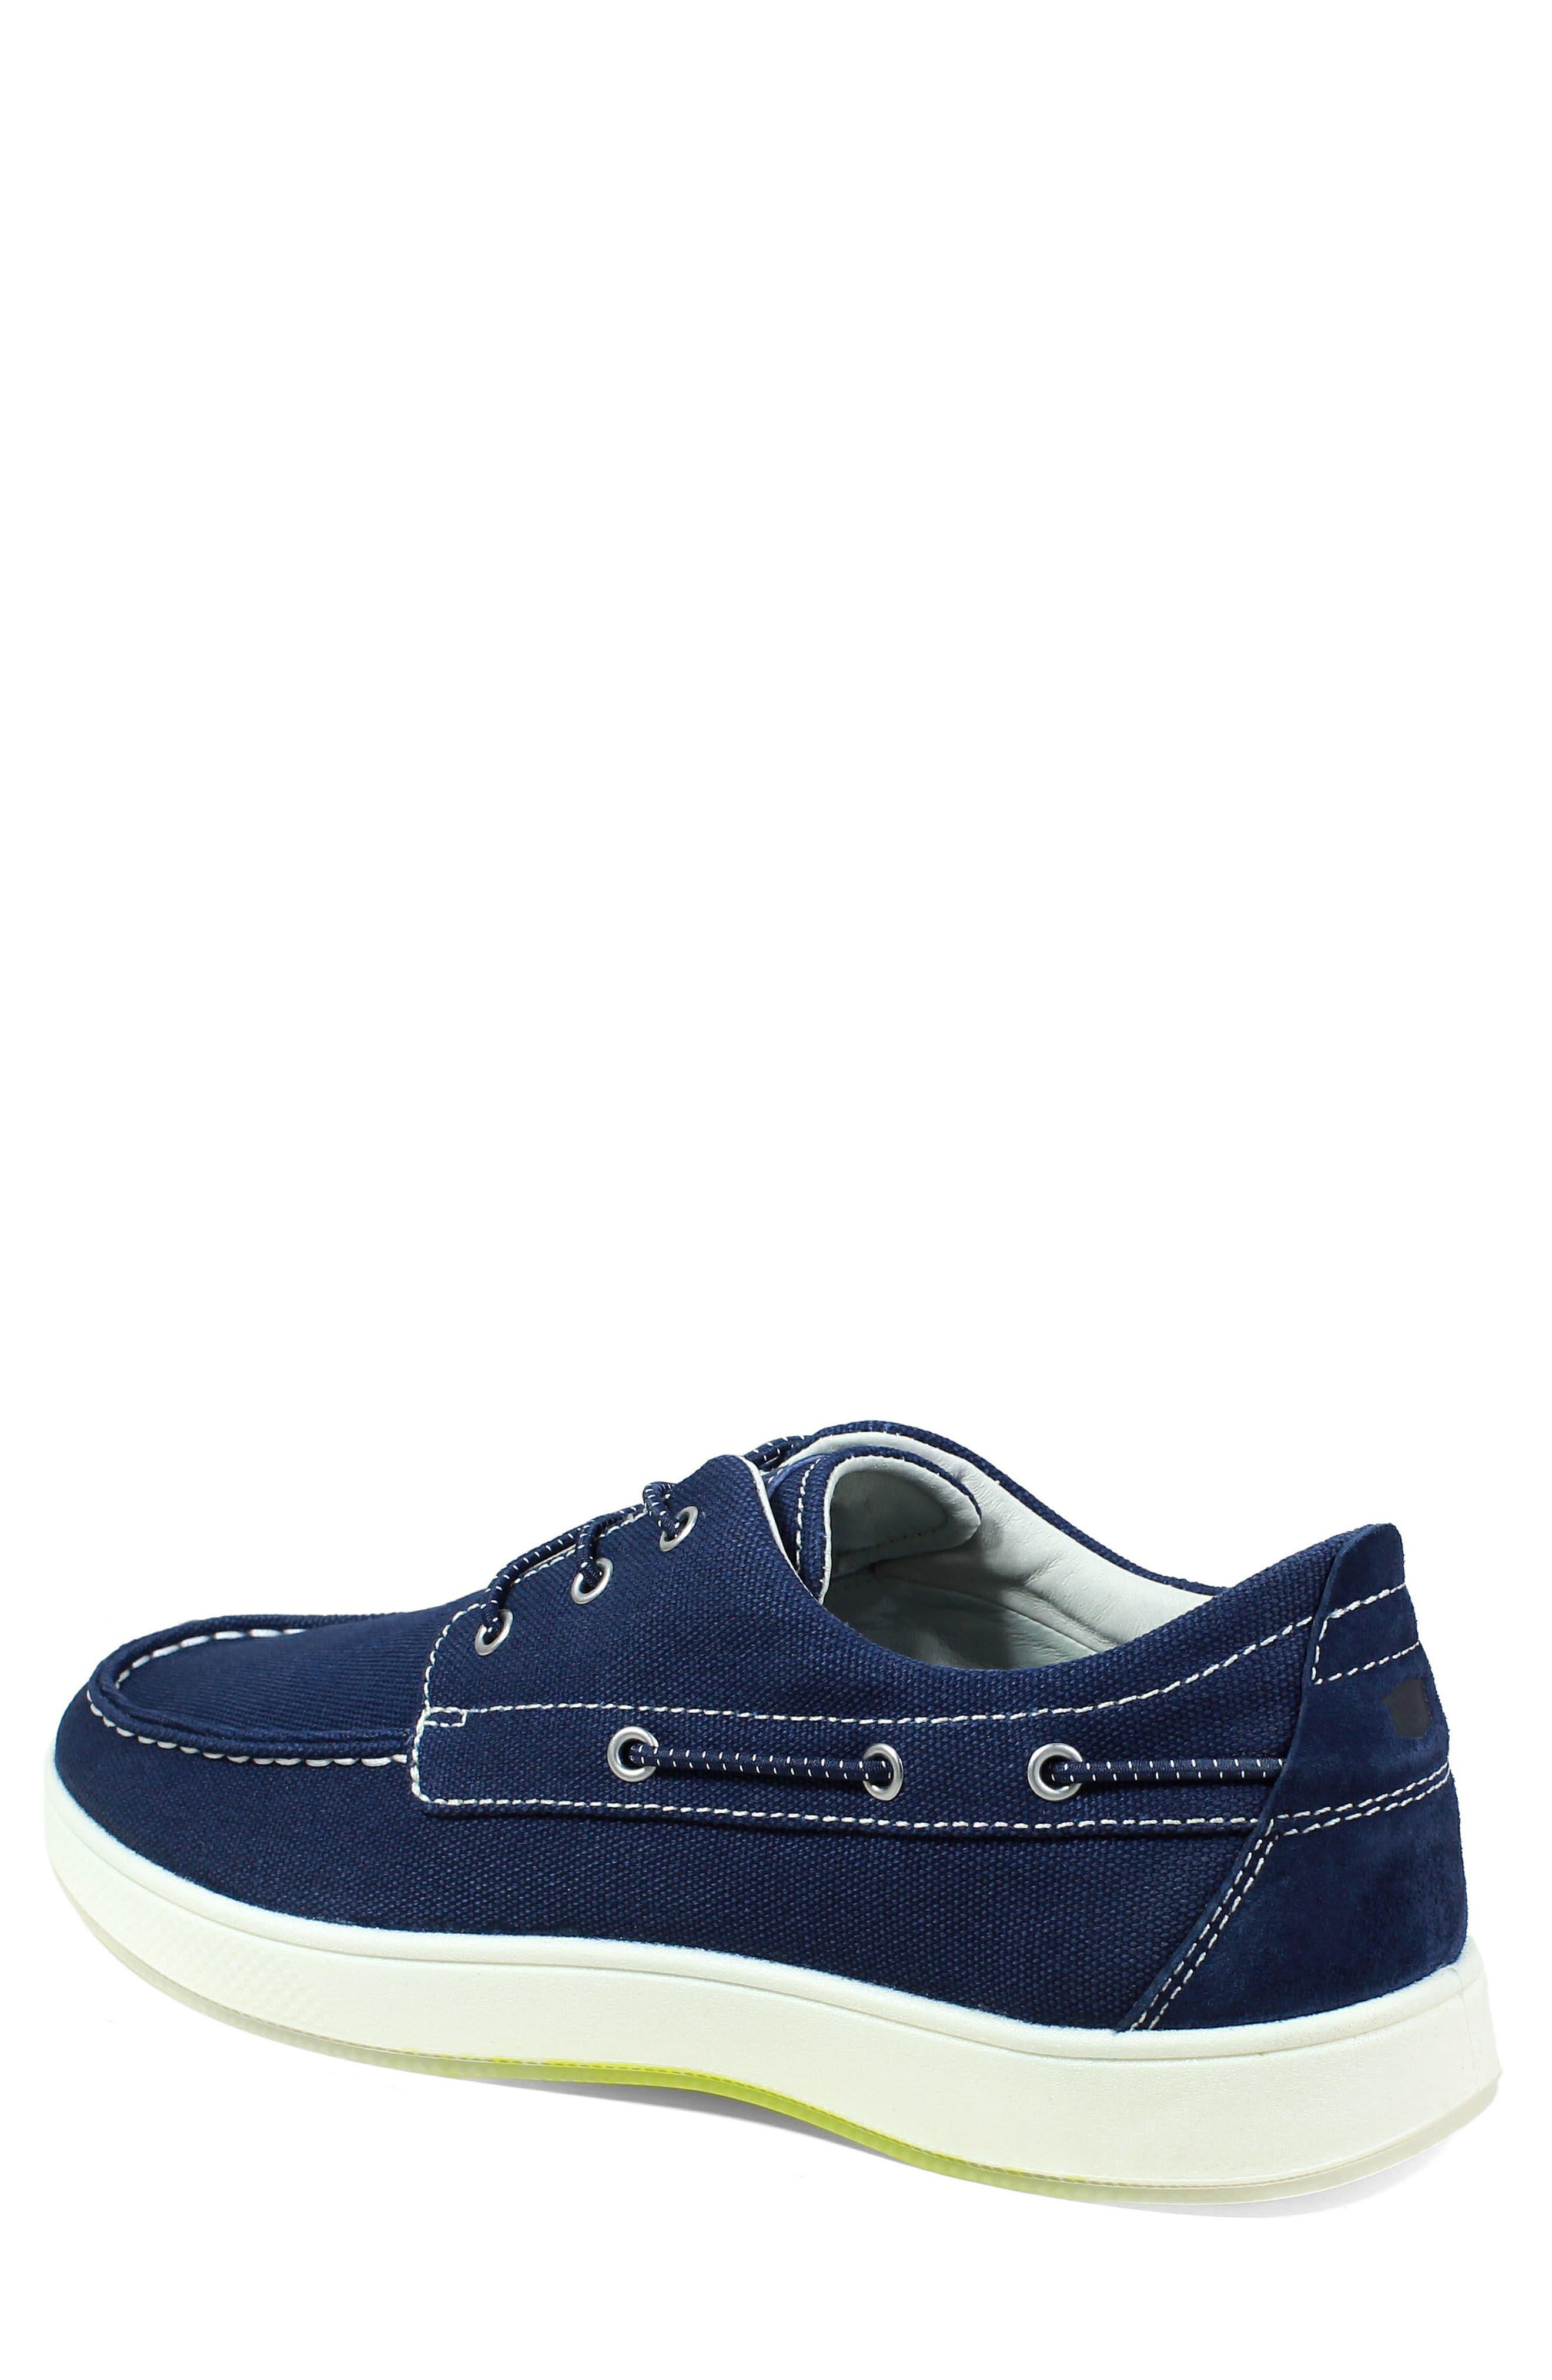 Edge Boat Shoe,                             Alternate thumbnail 2, color,                             NAVY CANVAS